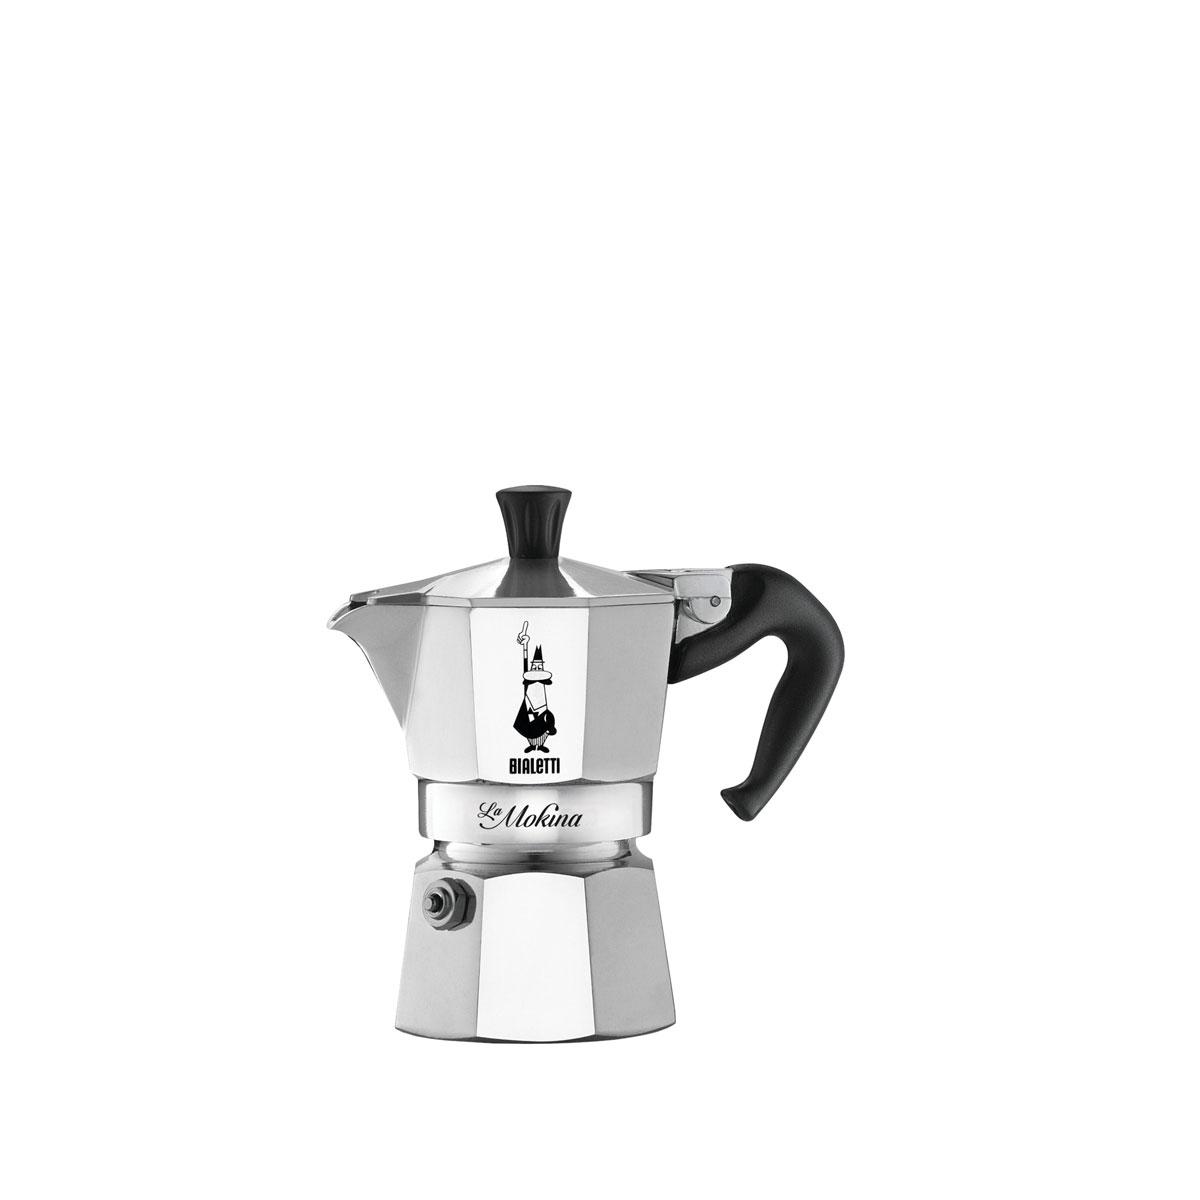 Espressokocher (1 Tasse)